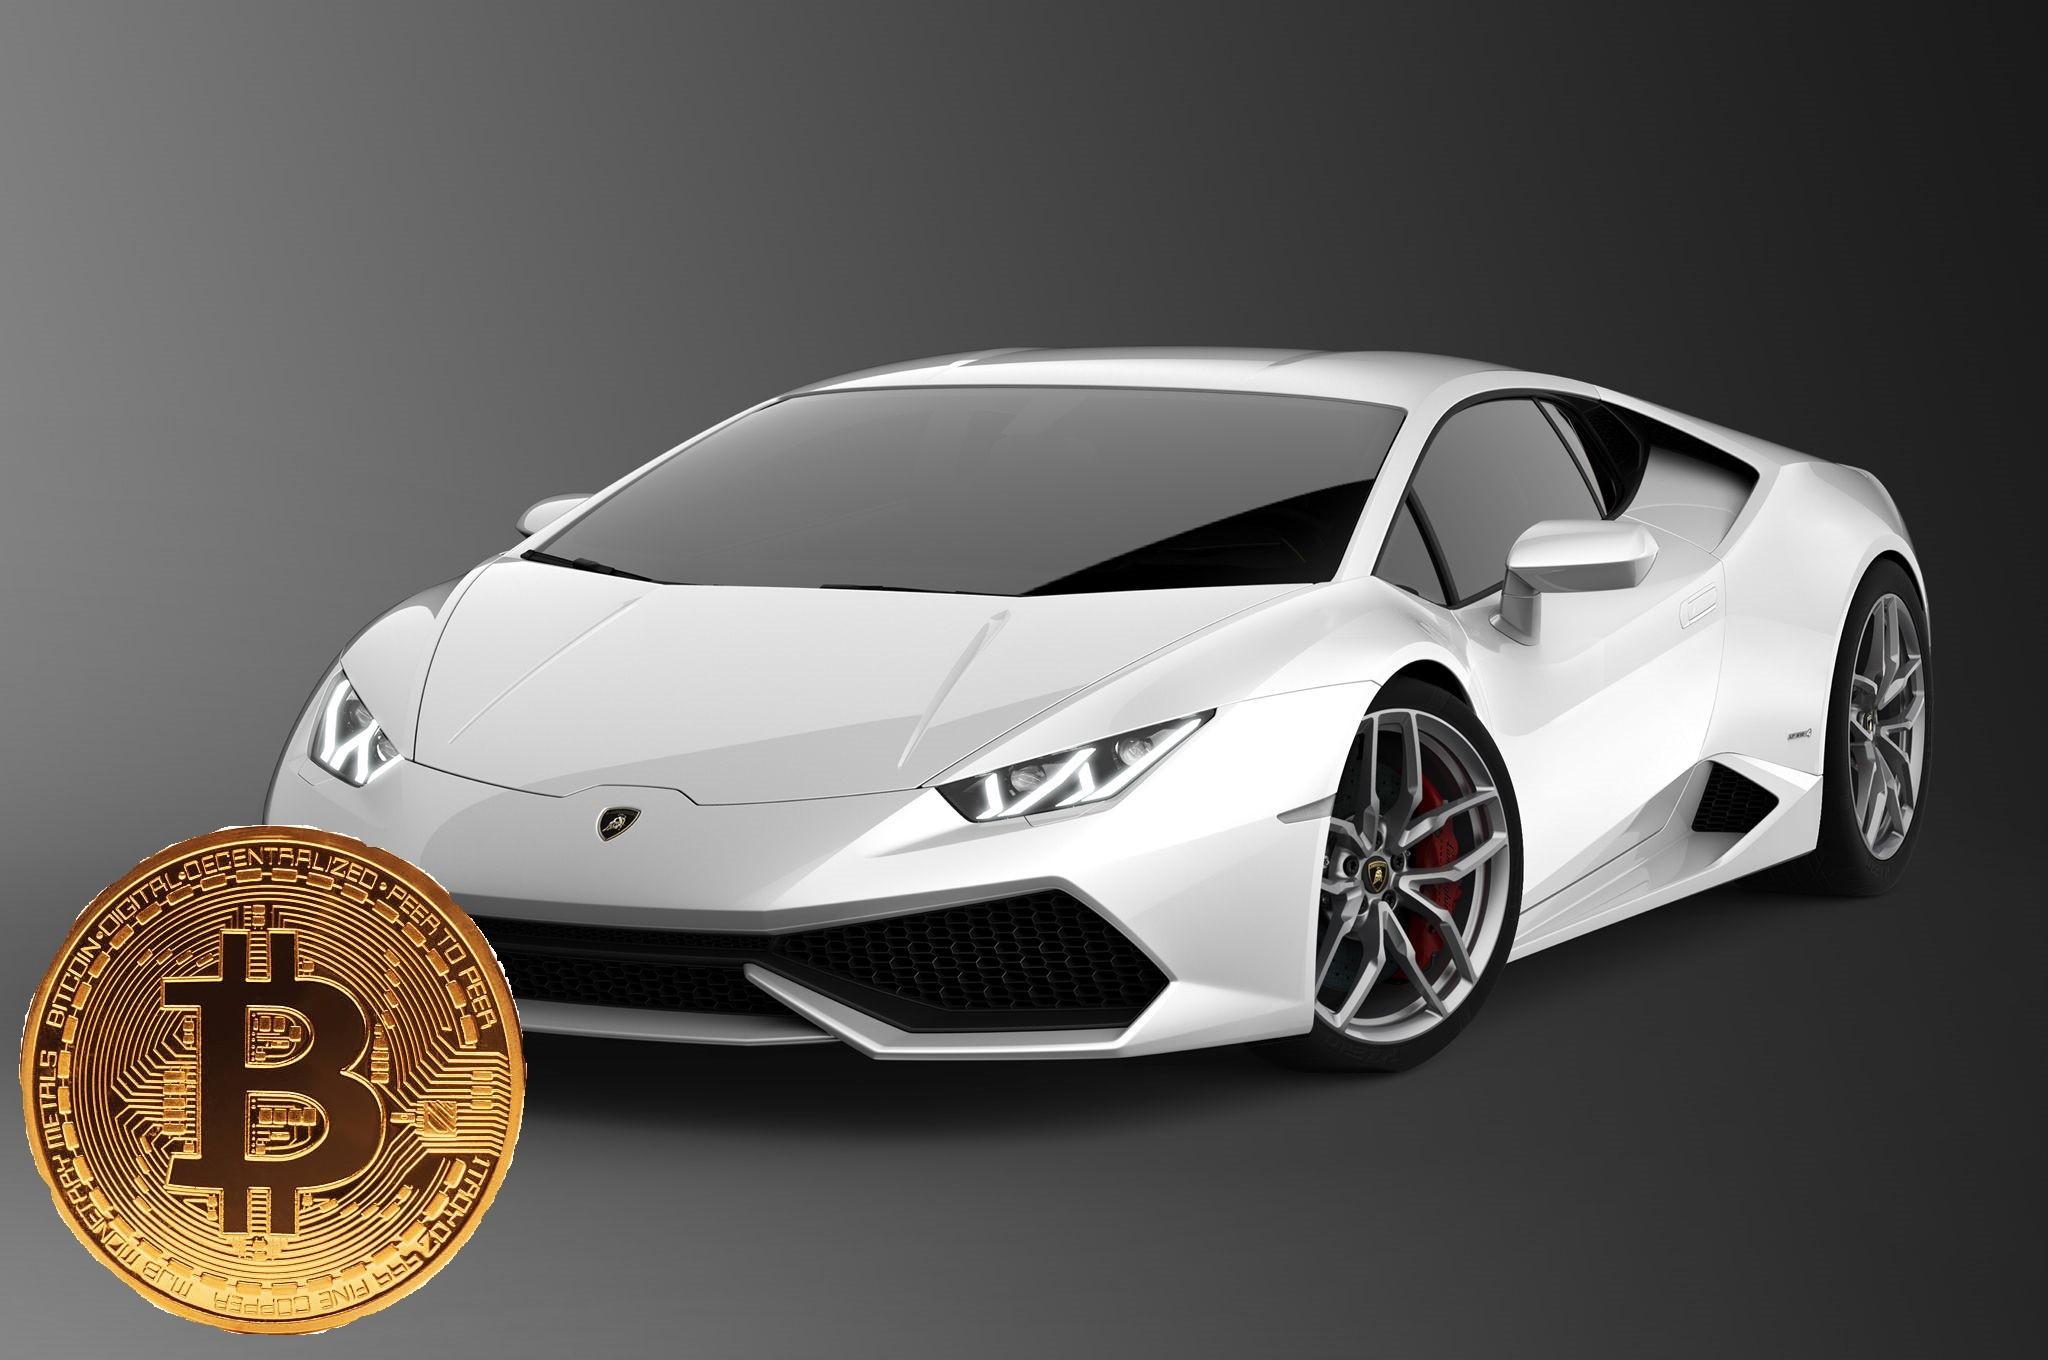 lamborghini bitcoin)